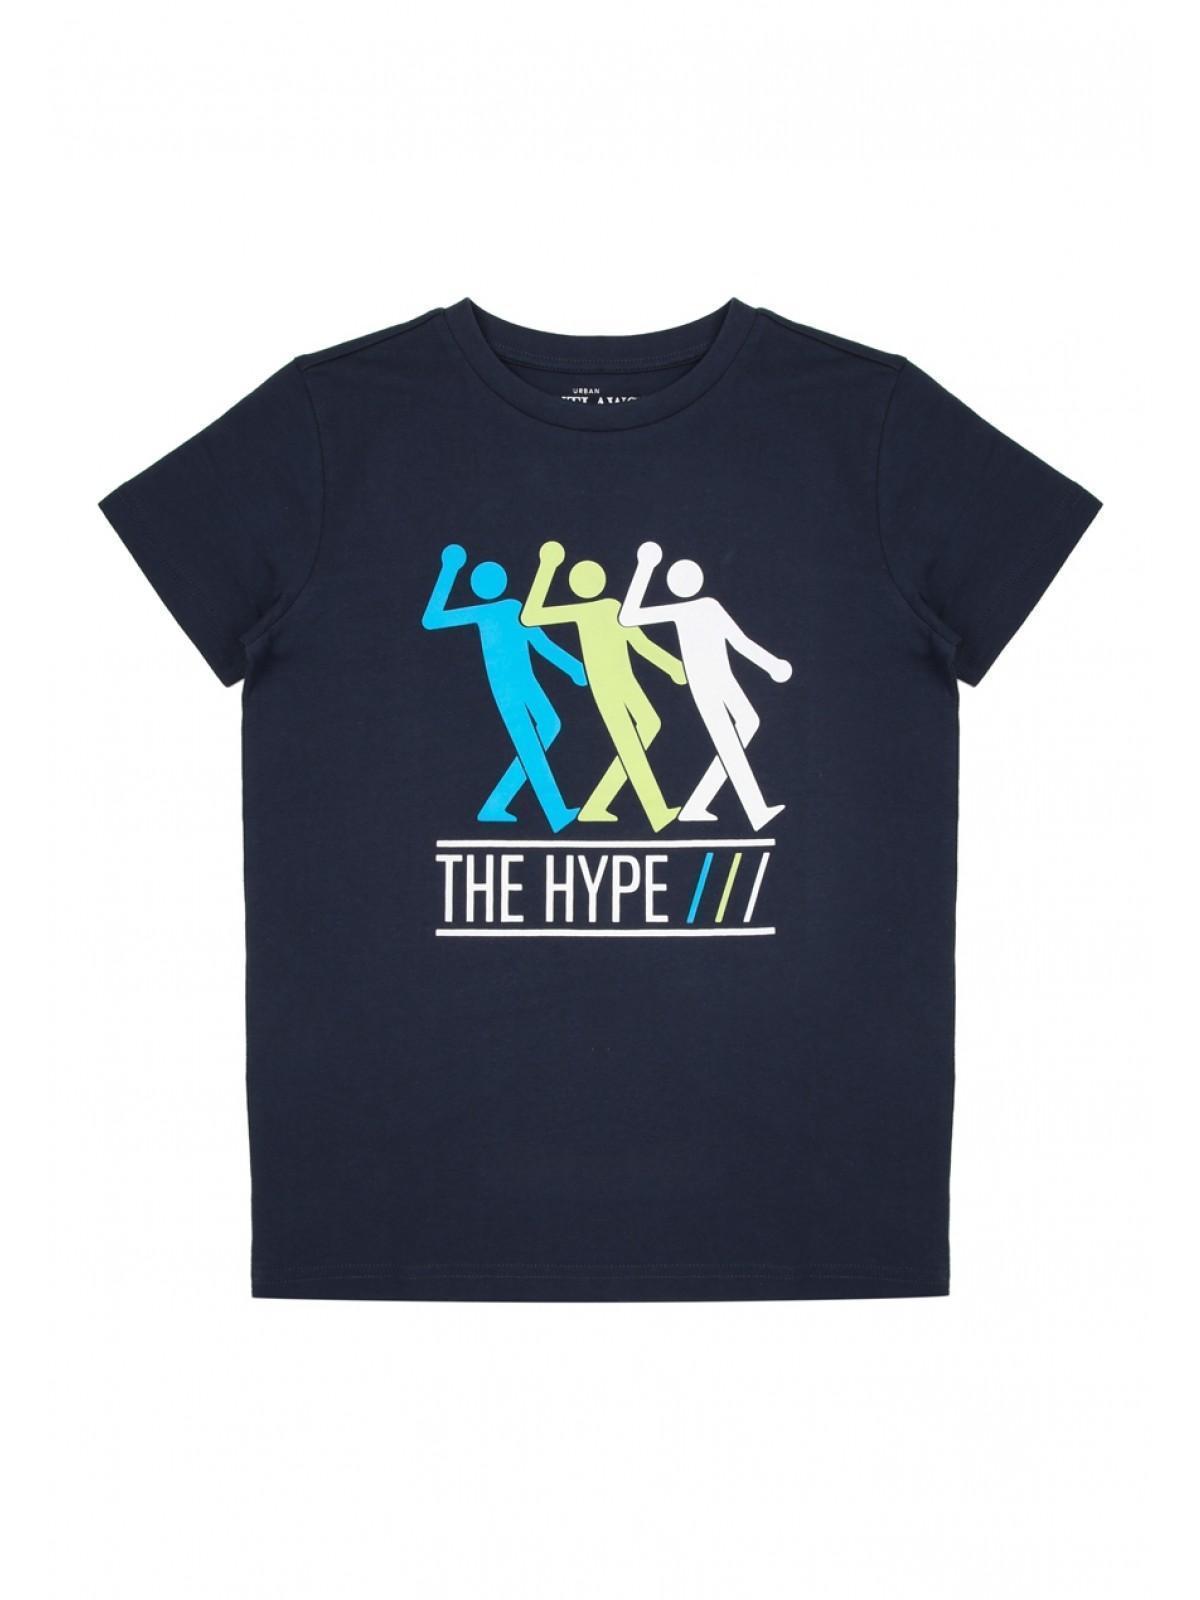 70fd1d4f1 Older Boys Navy Hype Slogan T-Shirt | Peacocks